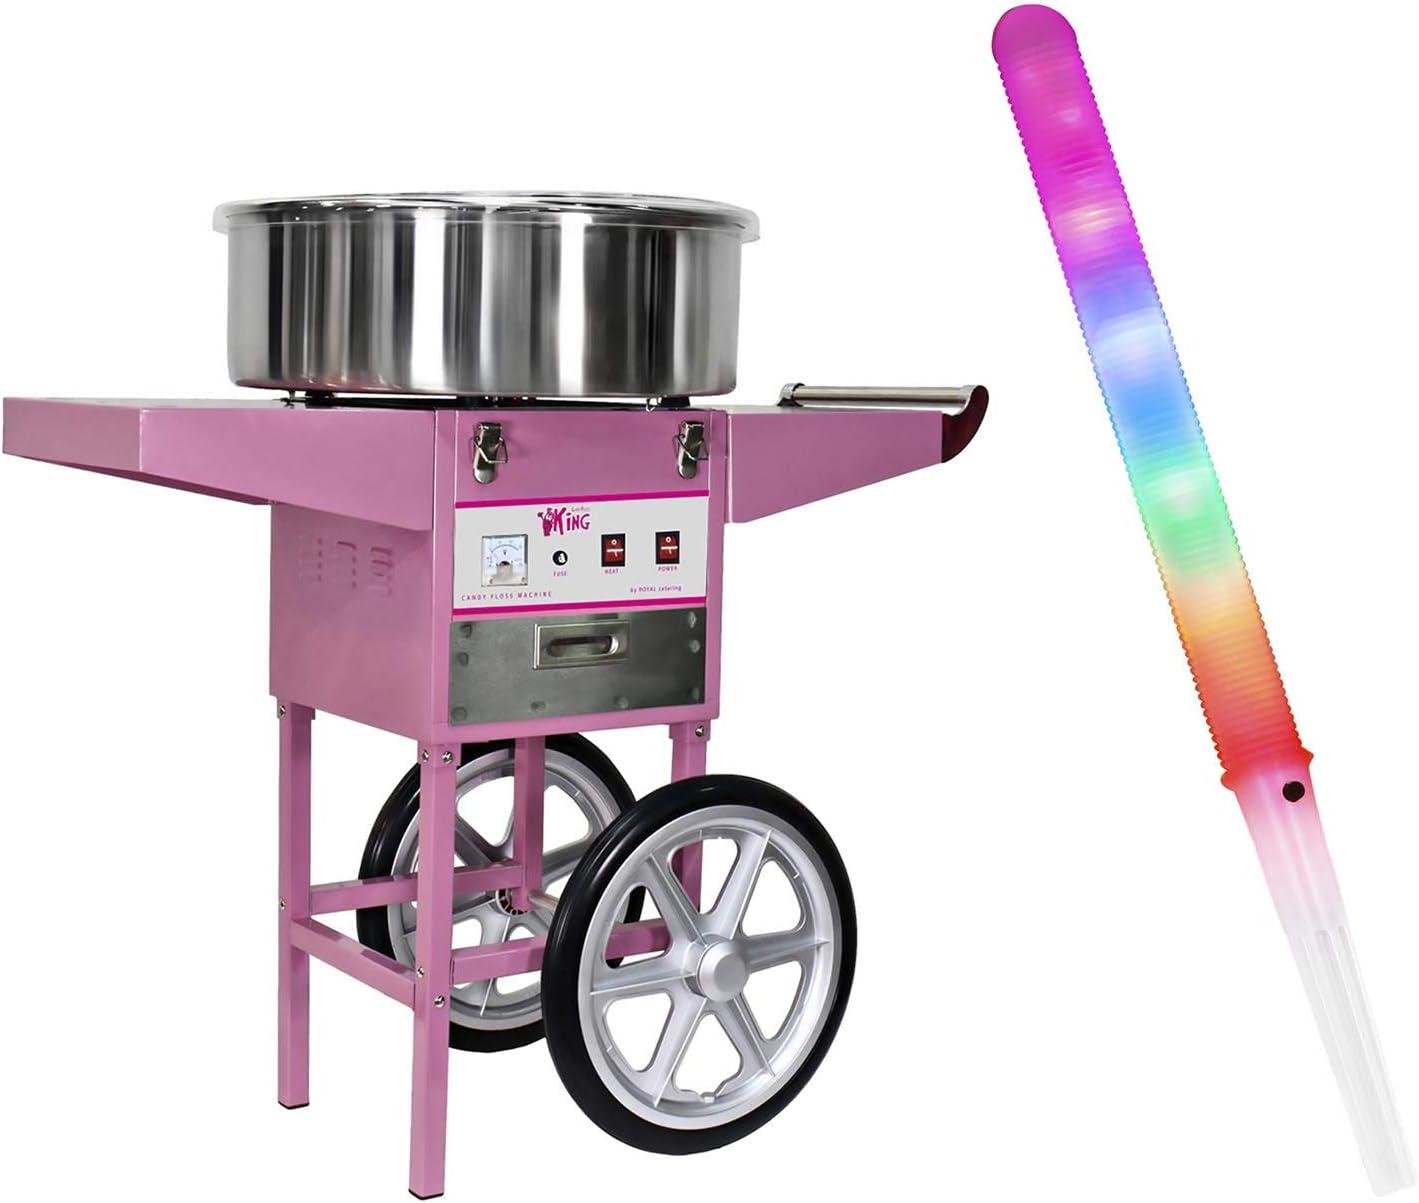 Royal Catering Algodonera Set De Máquina De Algodón De Azúcar RCZC-1200-W SET1 (Diámetro 52 cm, 1.200 Watt, Carrito y 100 Palillos LED): Amazon.es: Hogar